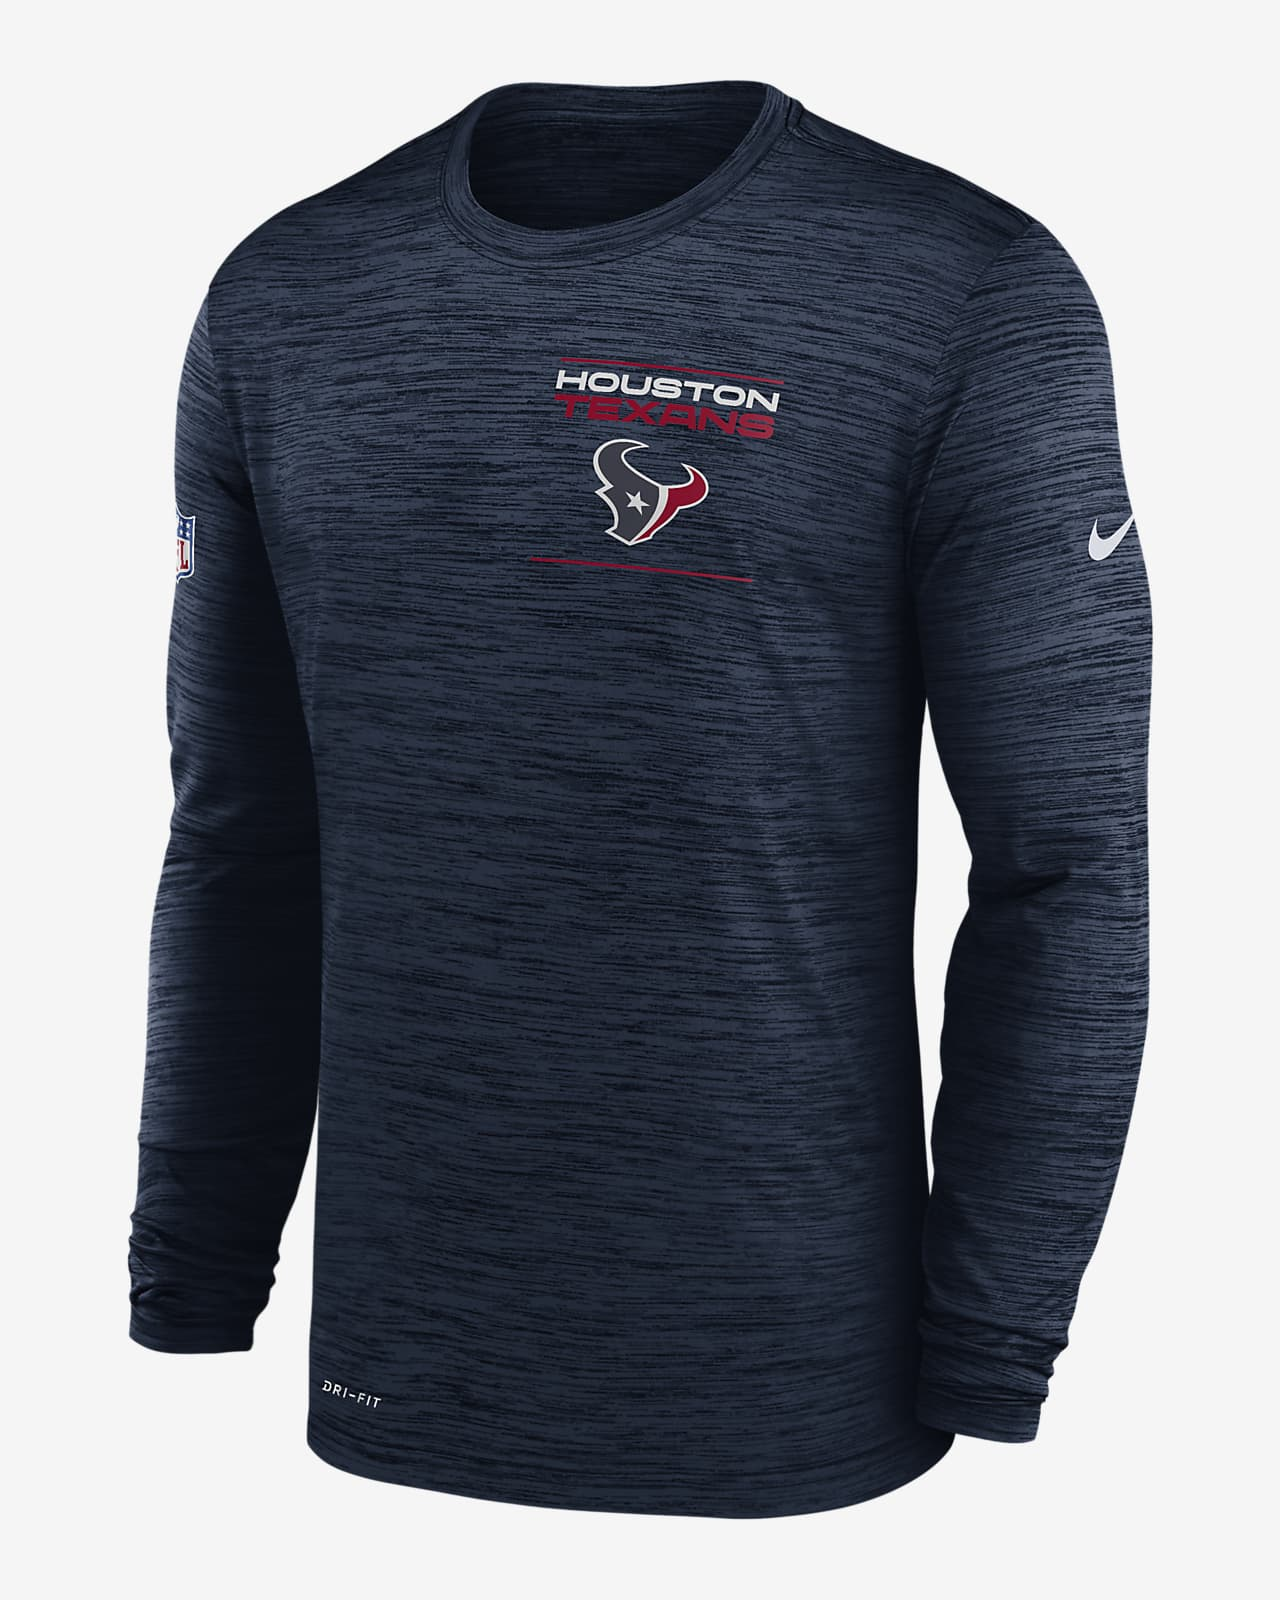 Nike Dri-FIT Sideline Velocity Legend (NFL Houston Texans) Men's Long-Sleeve T-Shirt